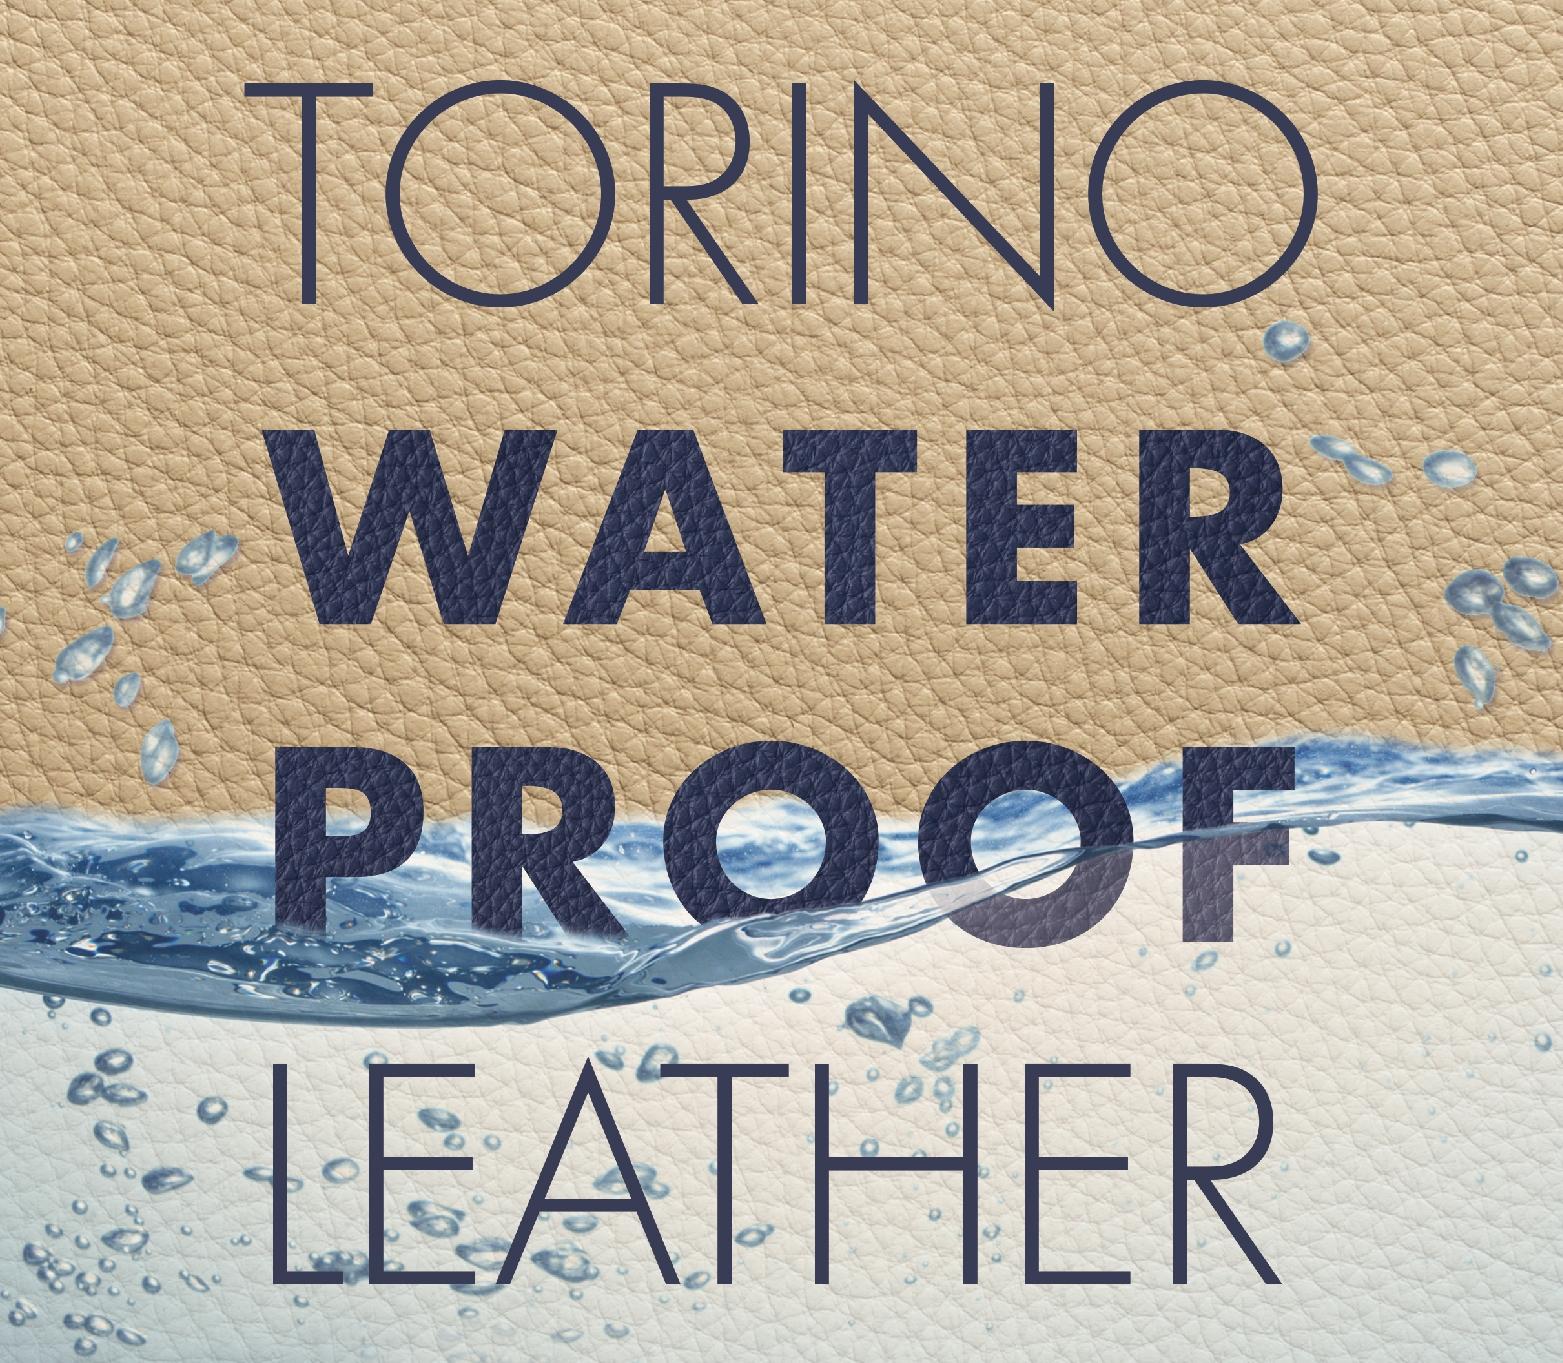 Torino Waterproof Leather